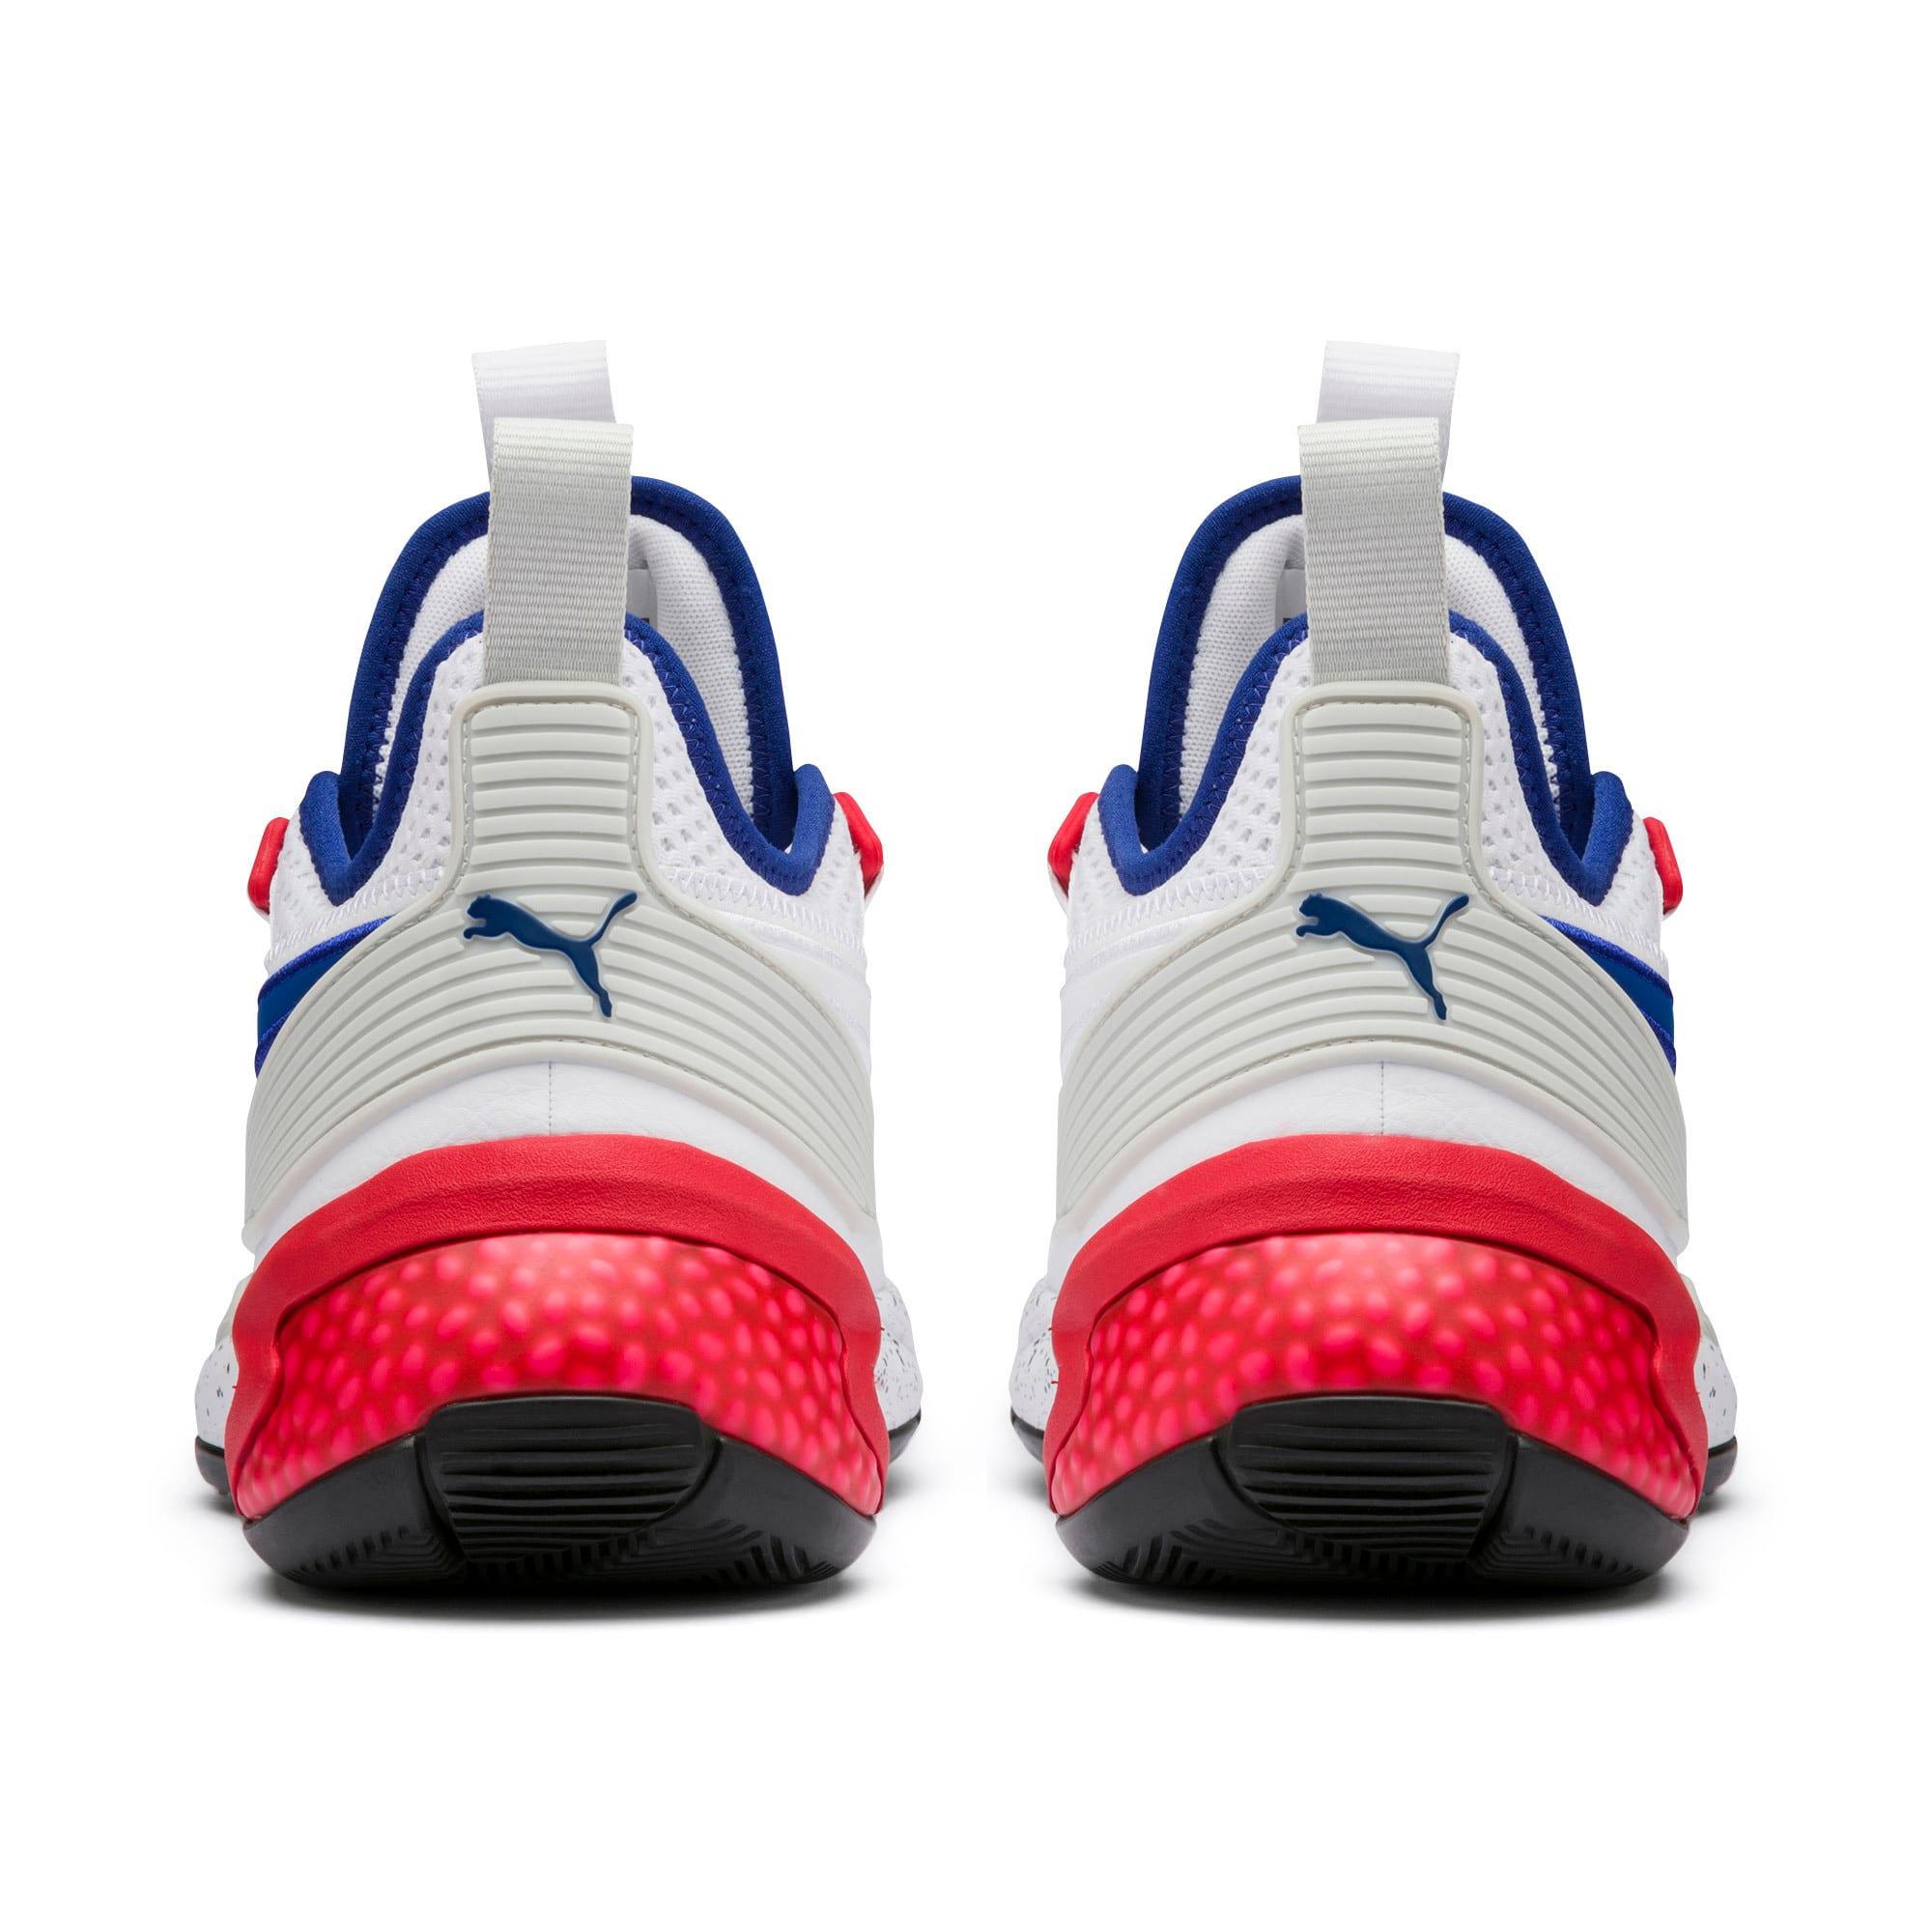 Thumbnail 3 of Chaussure de basketball Uproar Palace Guard pour homme, Puma White-Surf The Web, medium